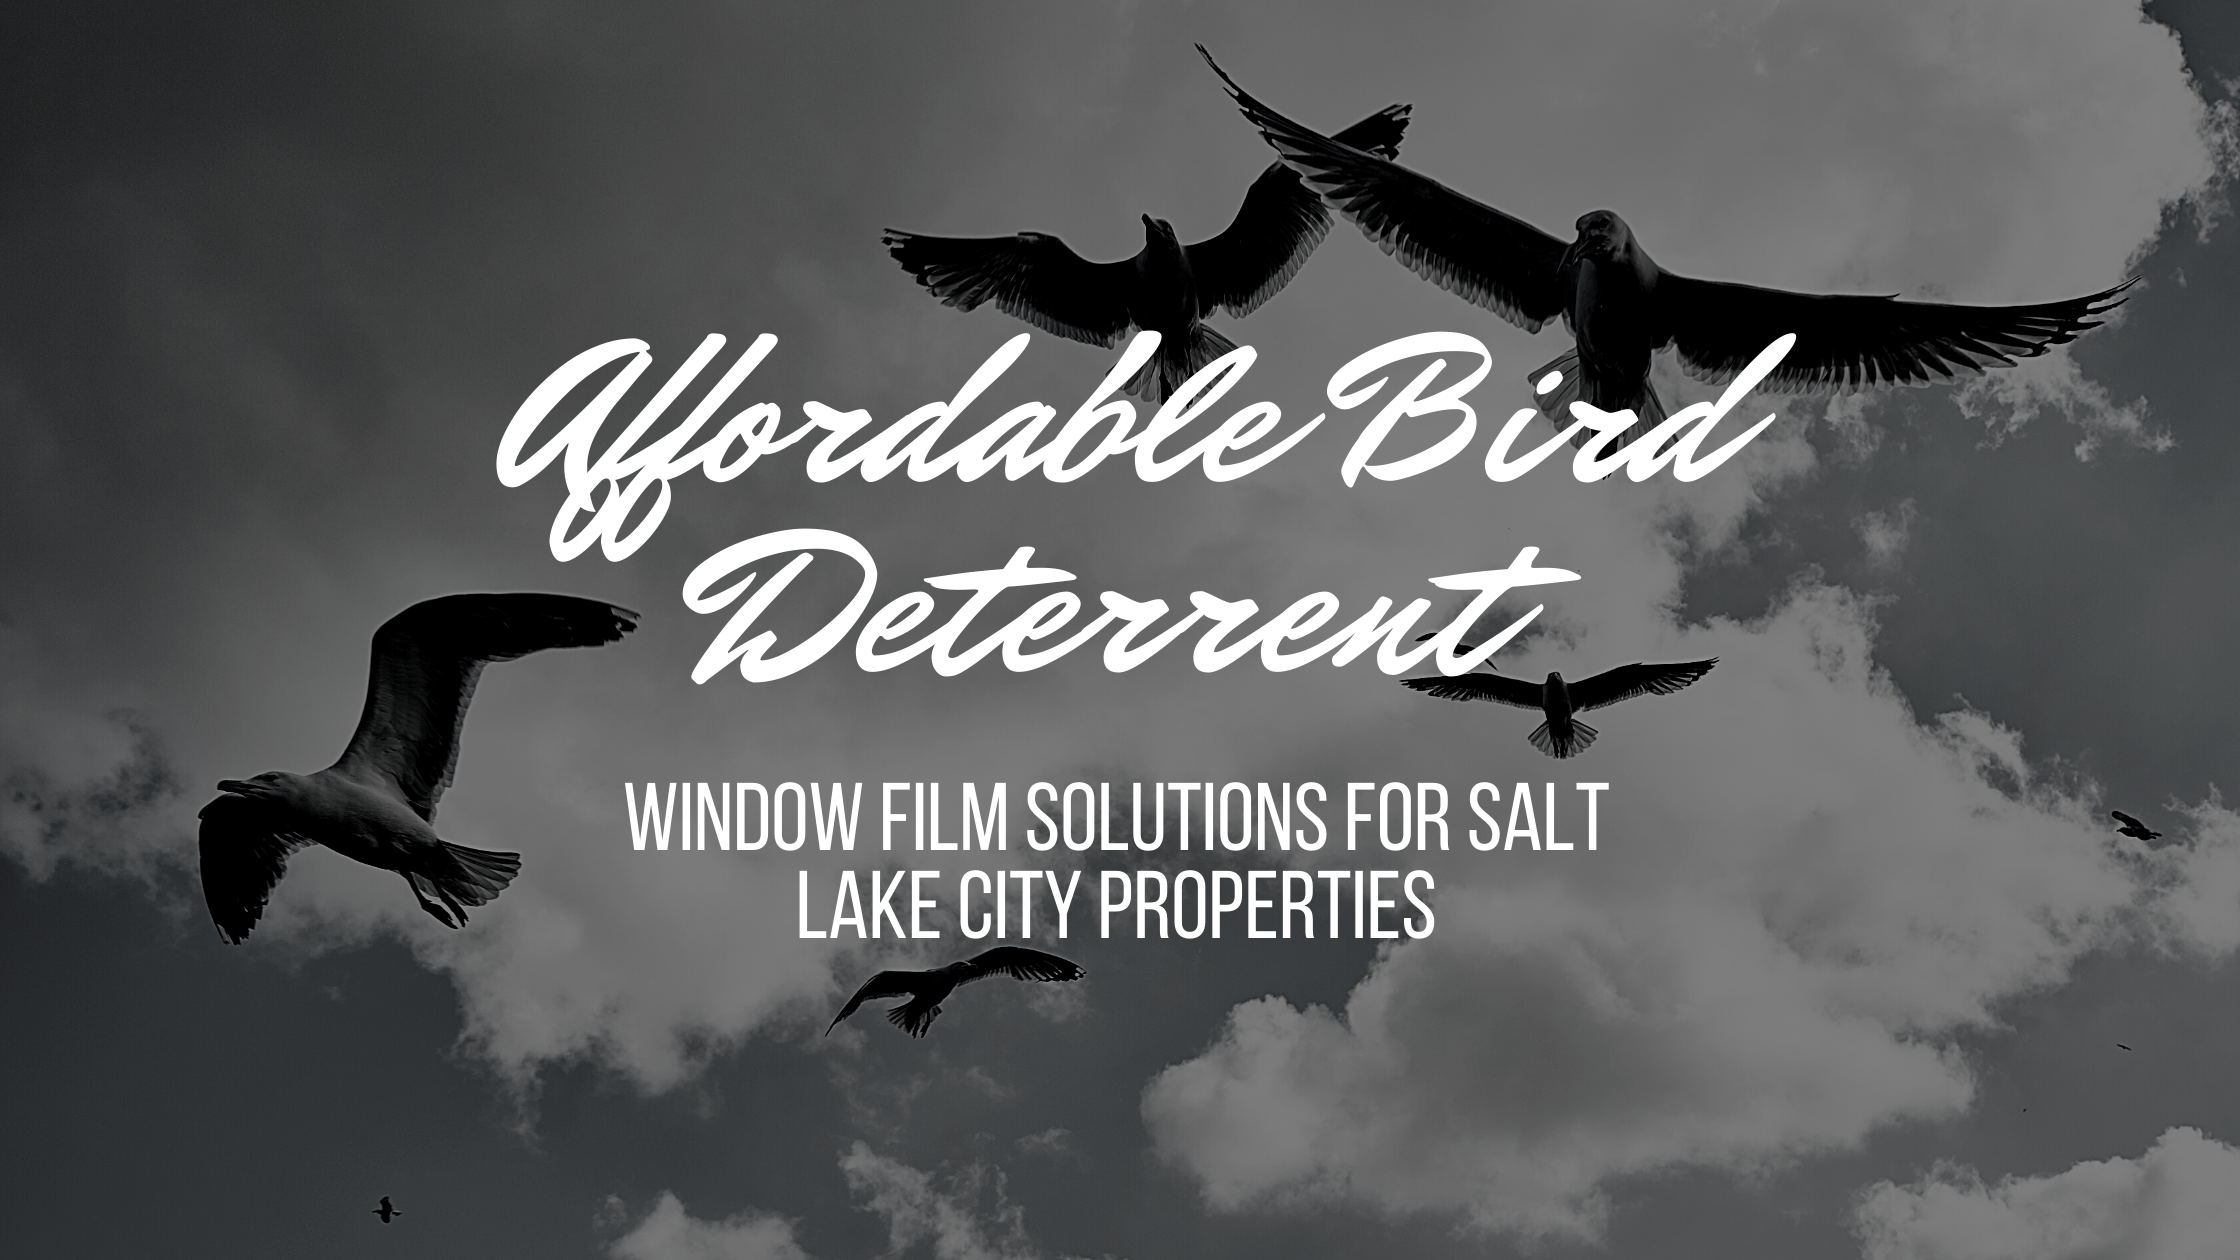 Affordable Bird Deterrent Window Film Solutions for Salt Lake City Properties